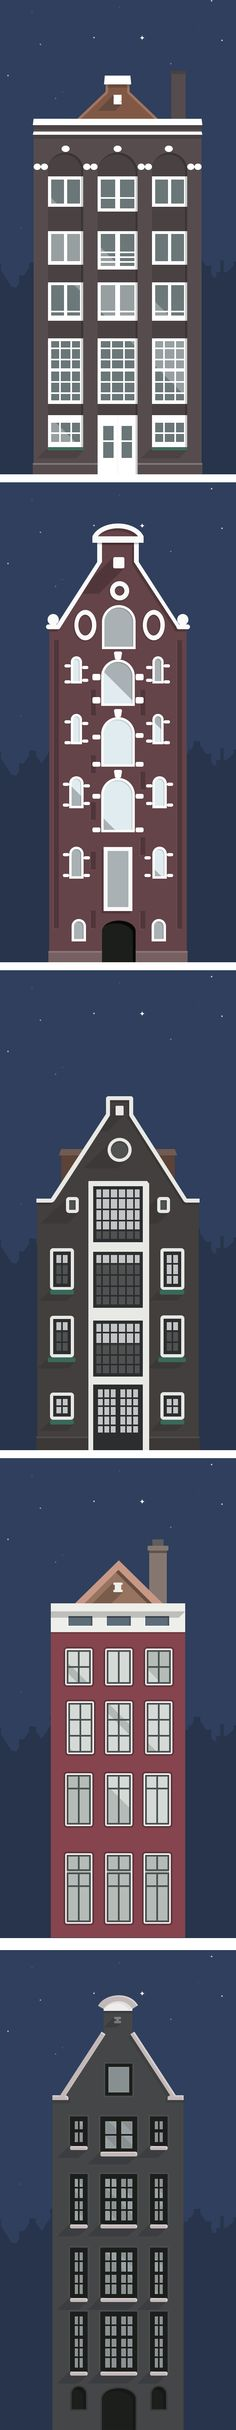 Amsterdam's Buildings Illustration by Sergey Shmidt, via Behance